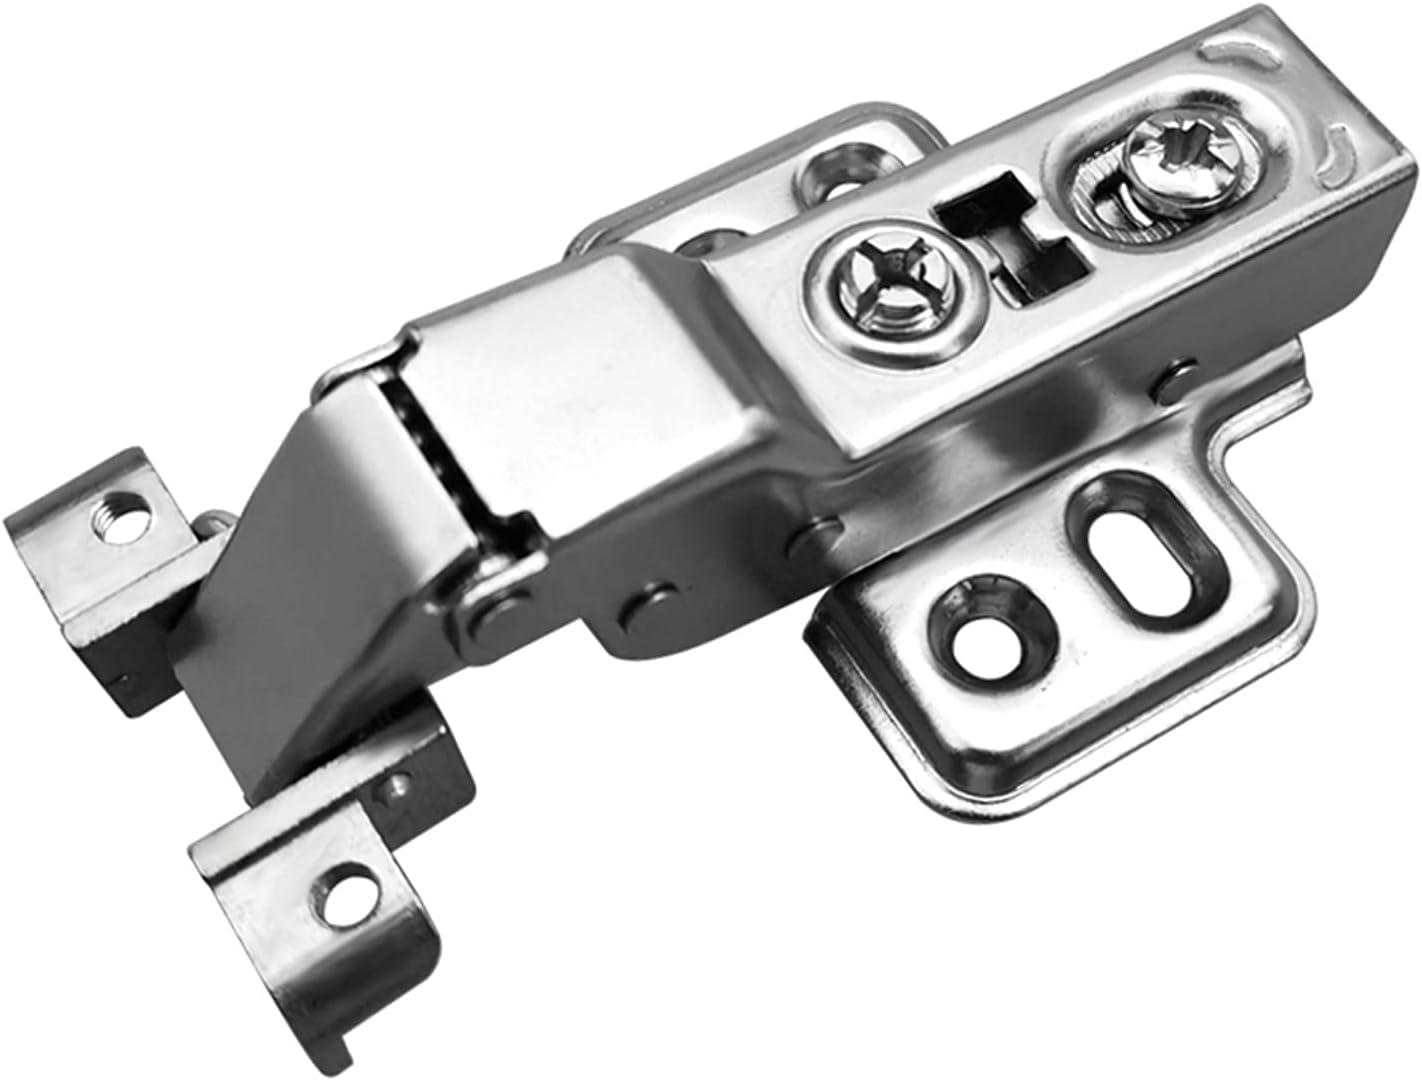 ZHANGM Aluminum Ranking TOP11 Frame Glass Door Rolled Cold Steel Hinge Silent Max 63% OFF